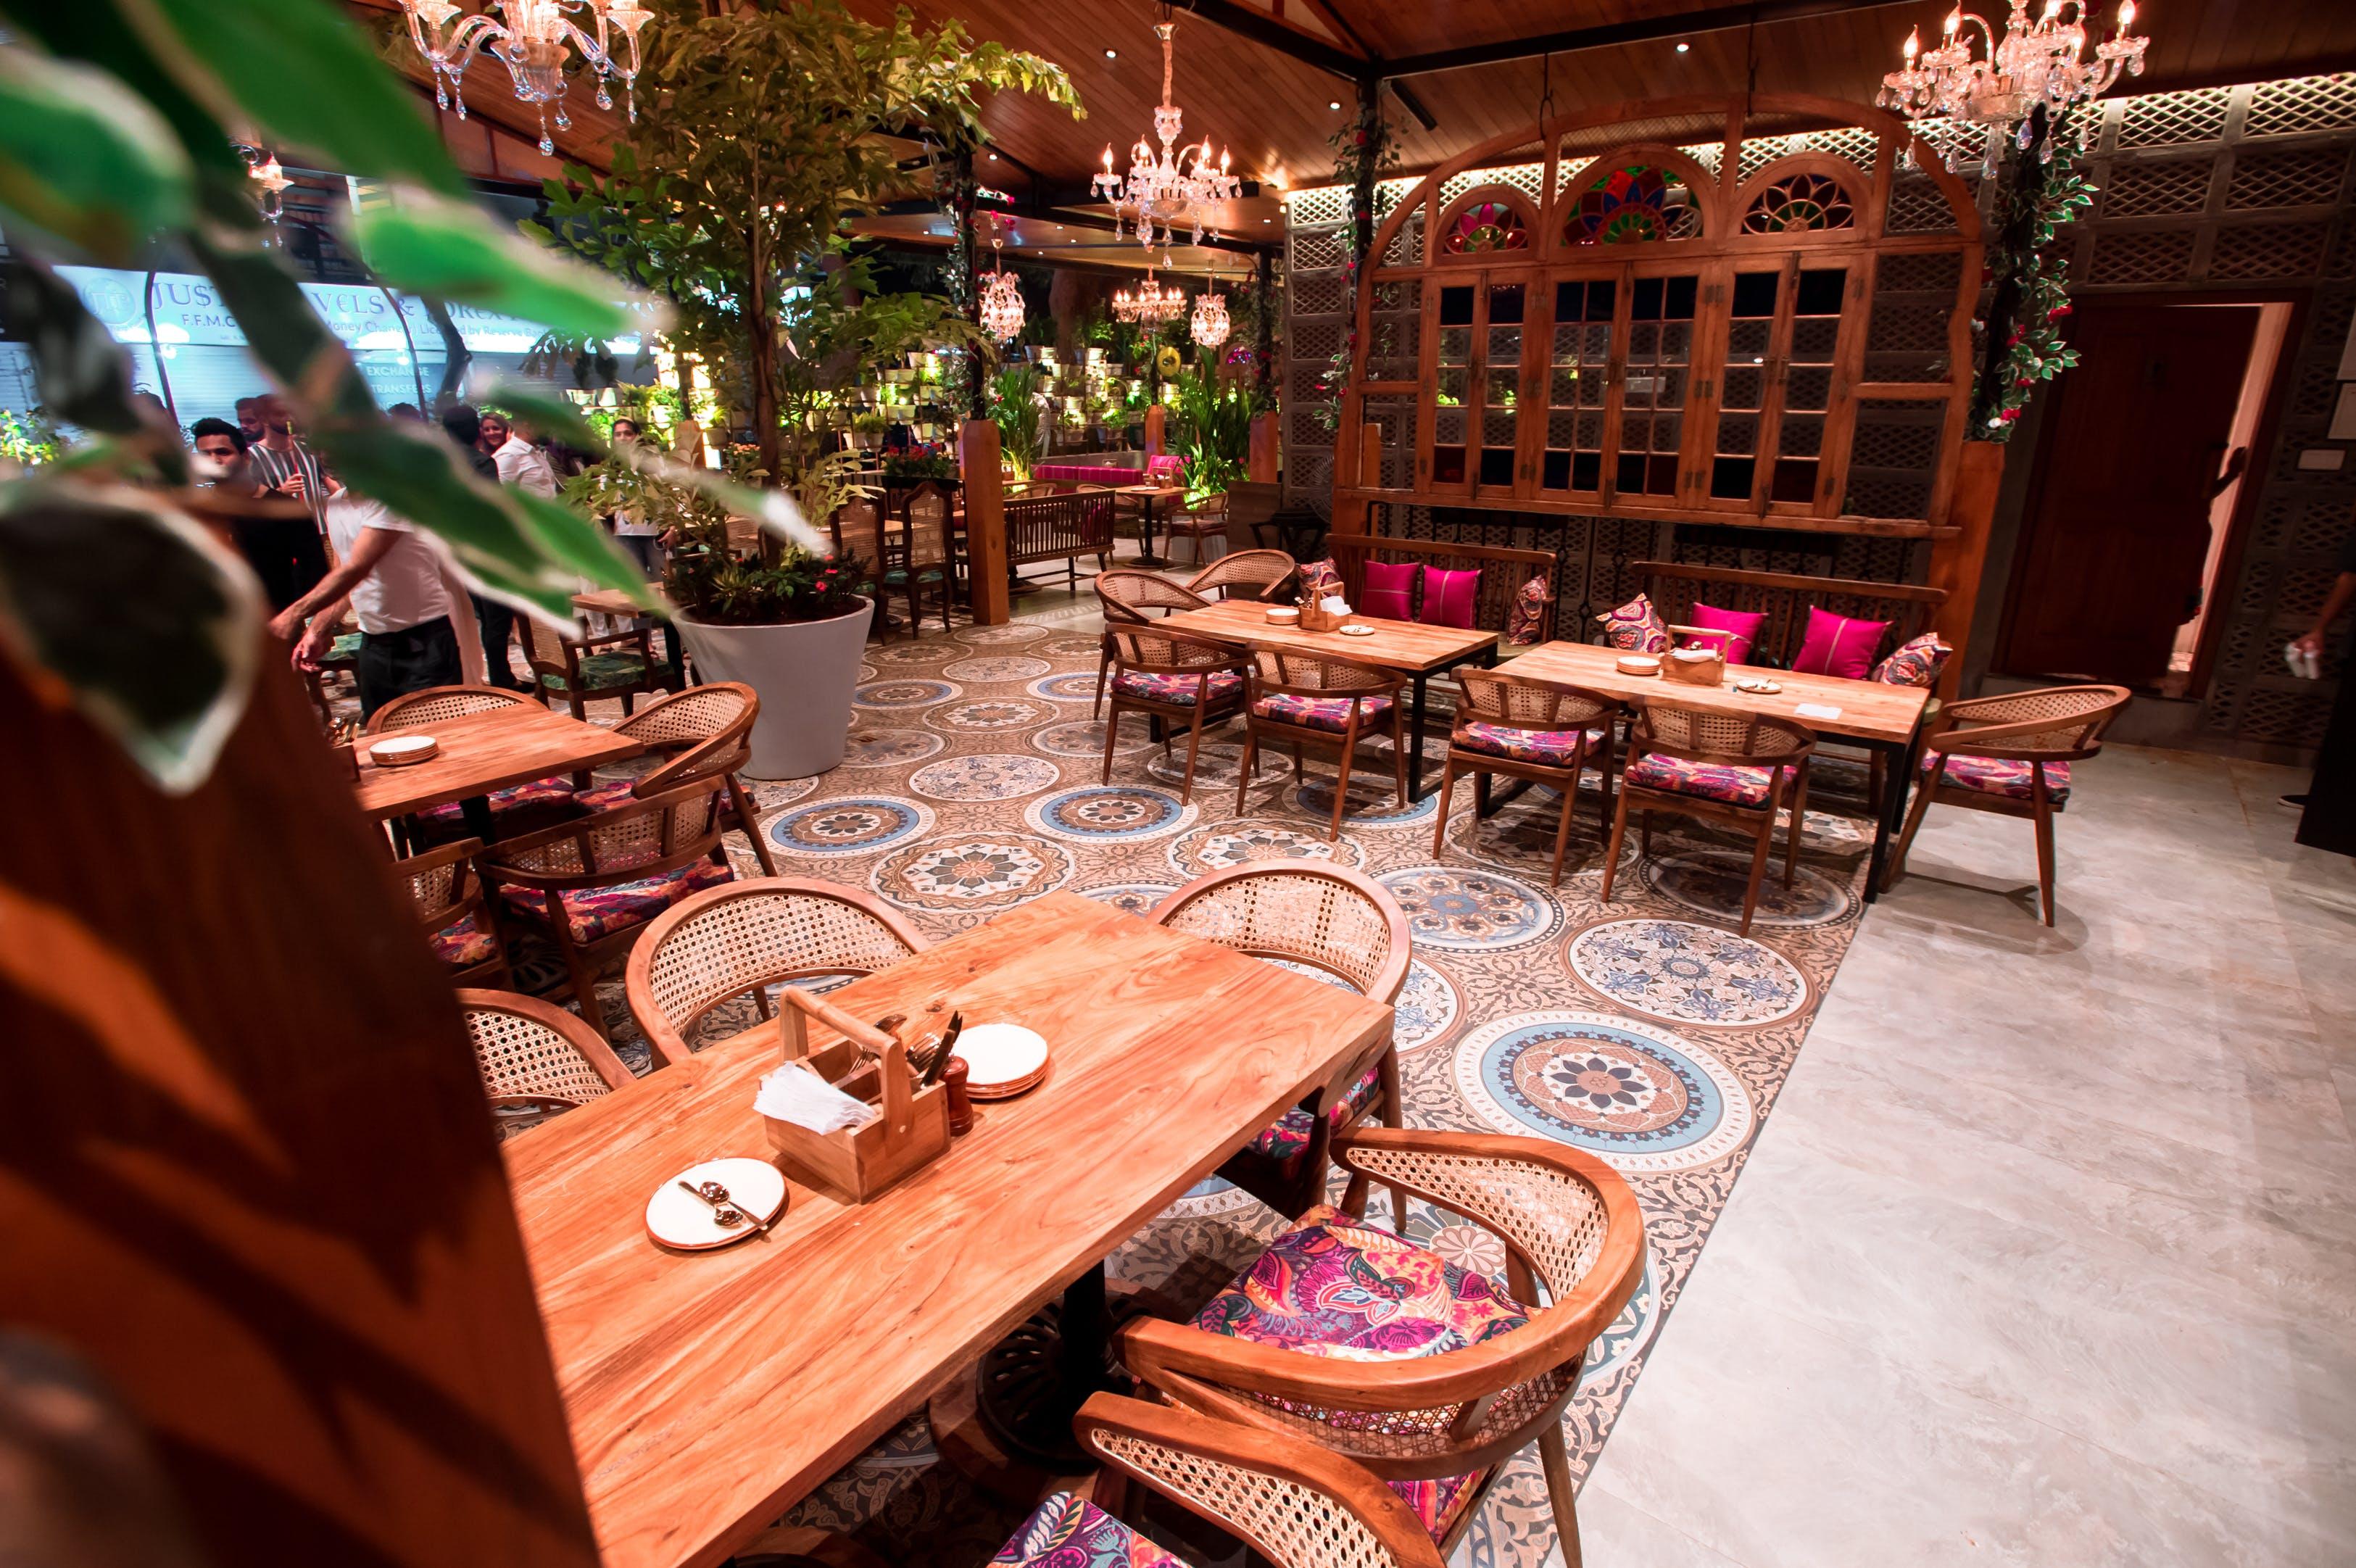 Restaurant,Table,Room,Interior design,Furniture,Café,Coffeehouse,House,Building,Brunch